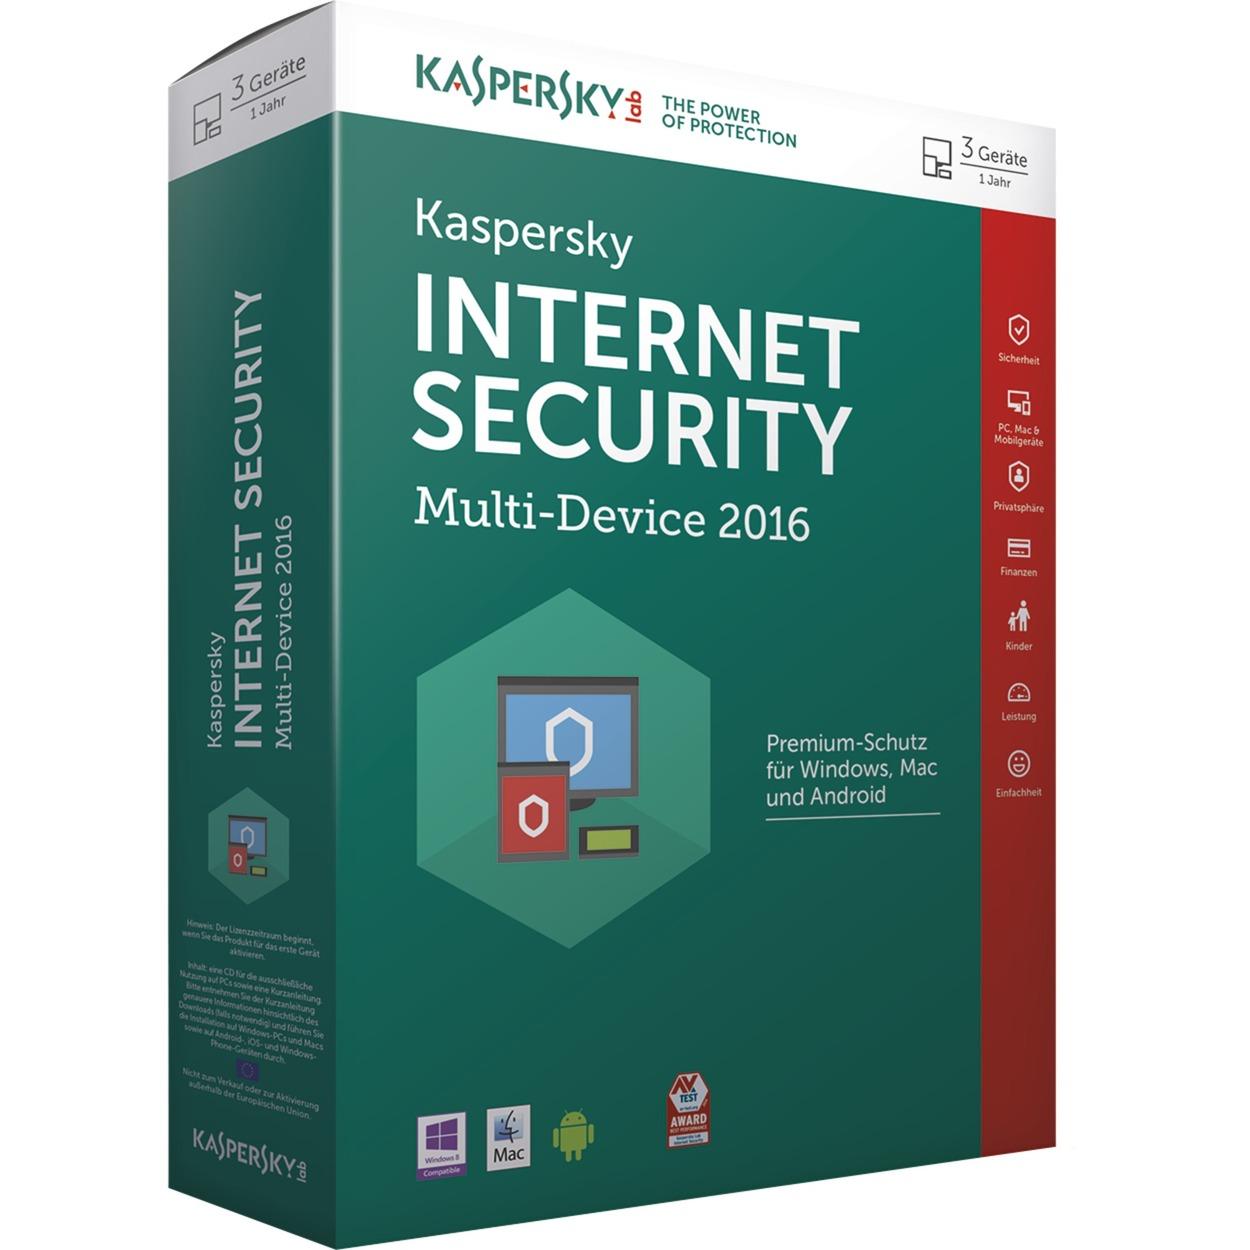 internetsecurity-2016-multidevice-mini-box-software